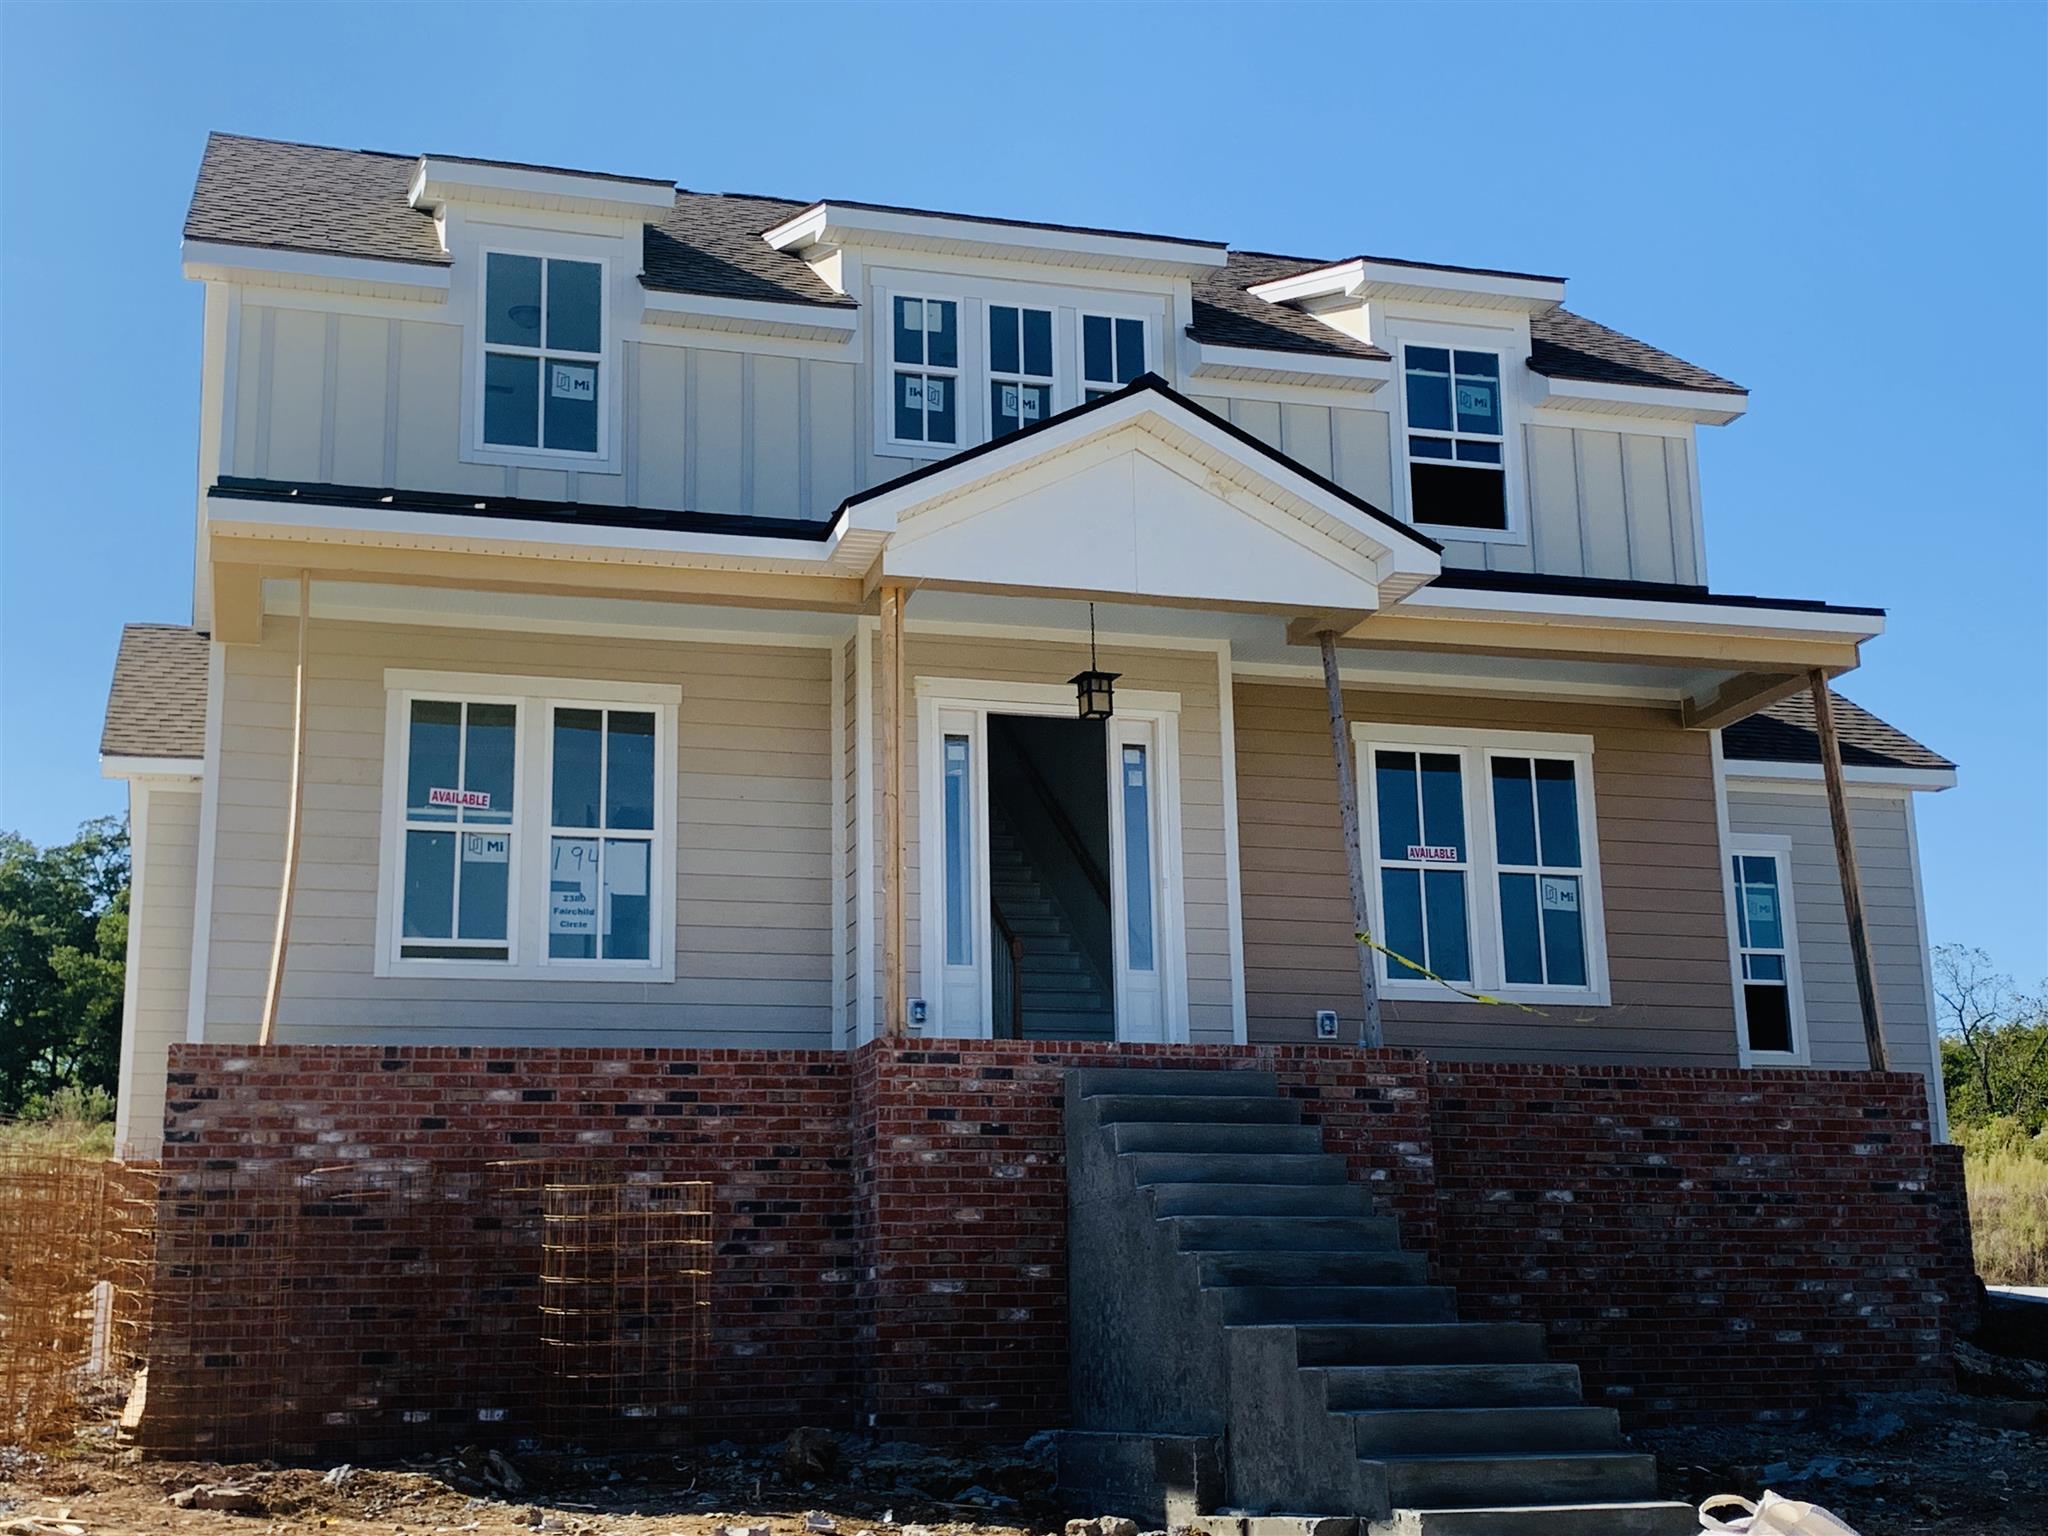 2380 Fairchild Circle, Nolensville, TN 37135 - Nolensville, TN real estate listing